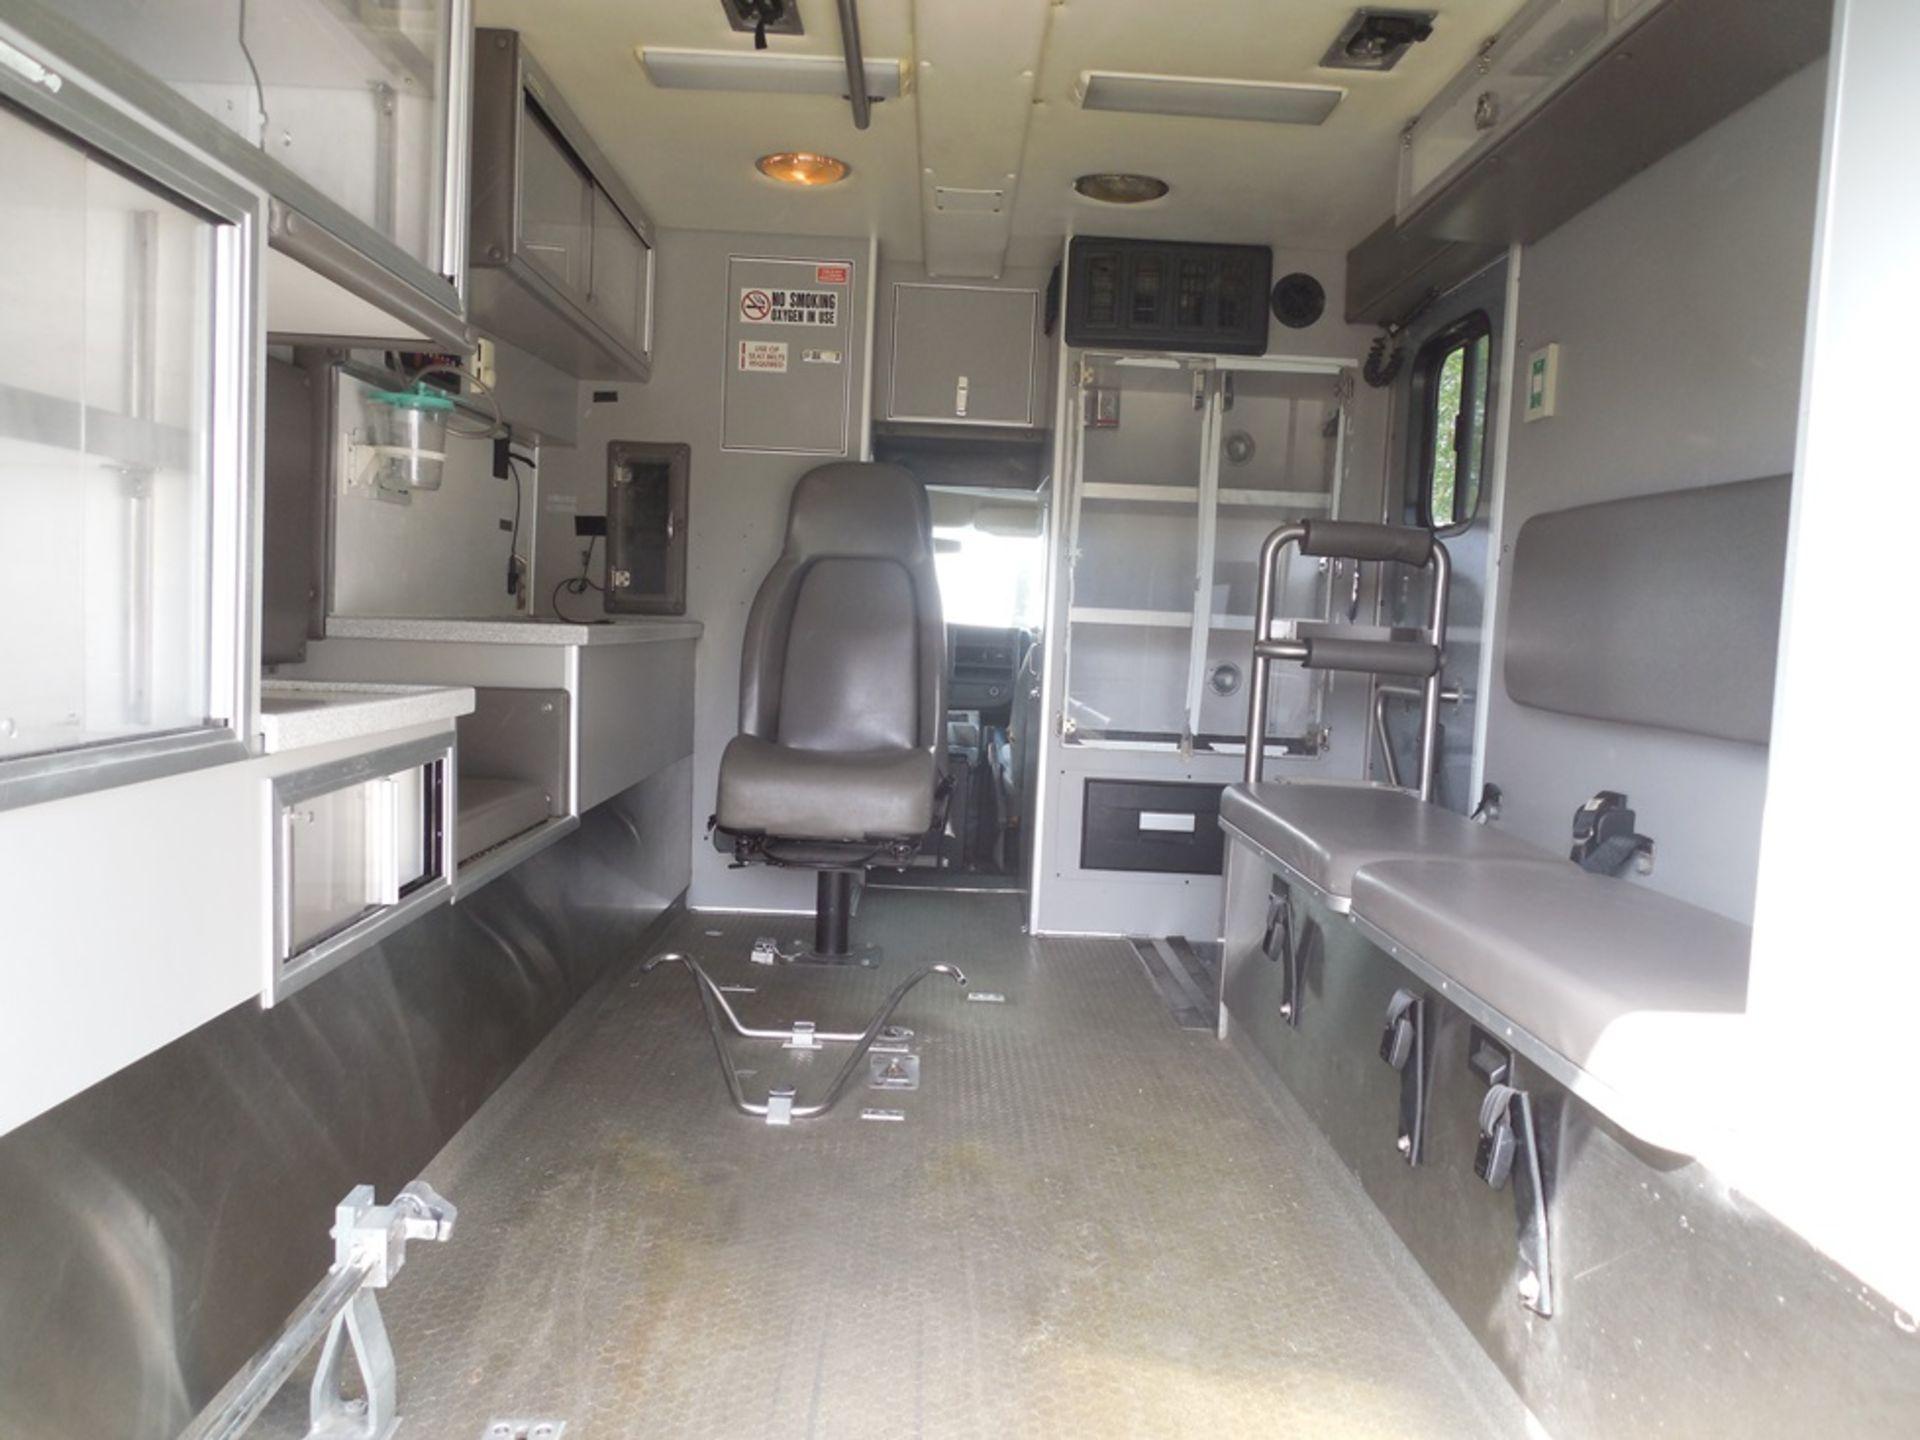 2010 Chev box van ambulance dsl, 250,597 miles, vin# 1GB9G5B65A1116120 - Image 6 of 6